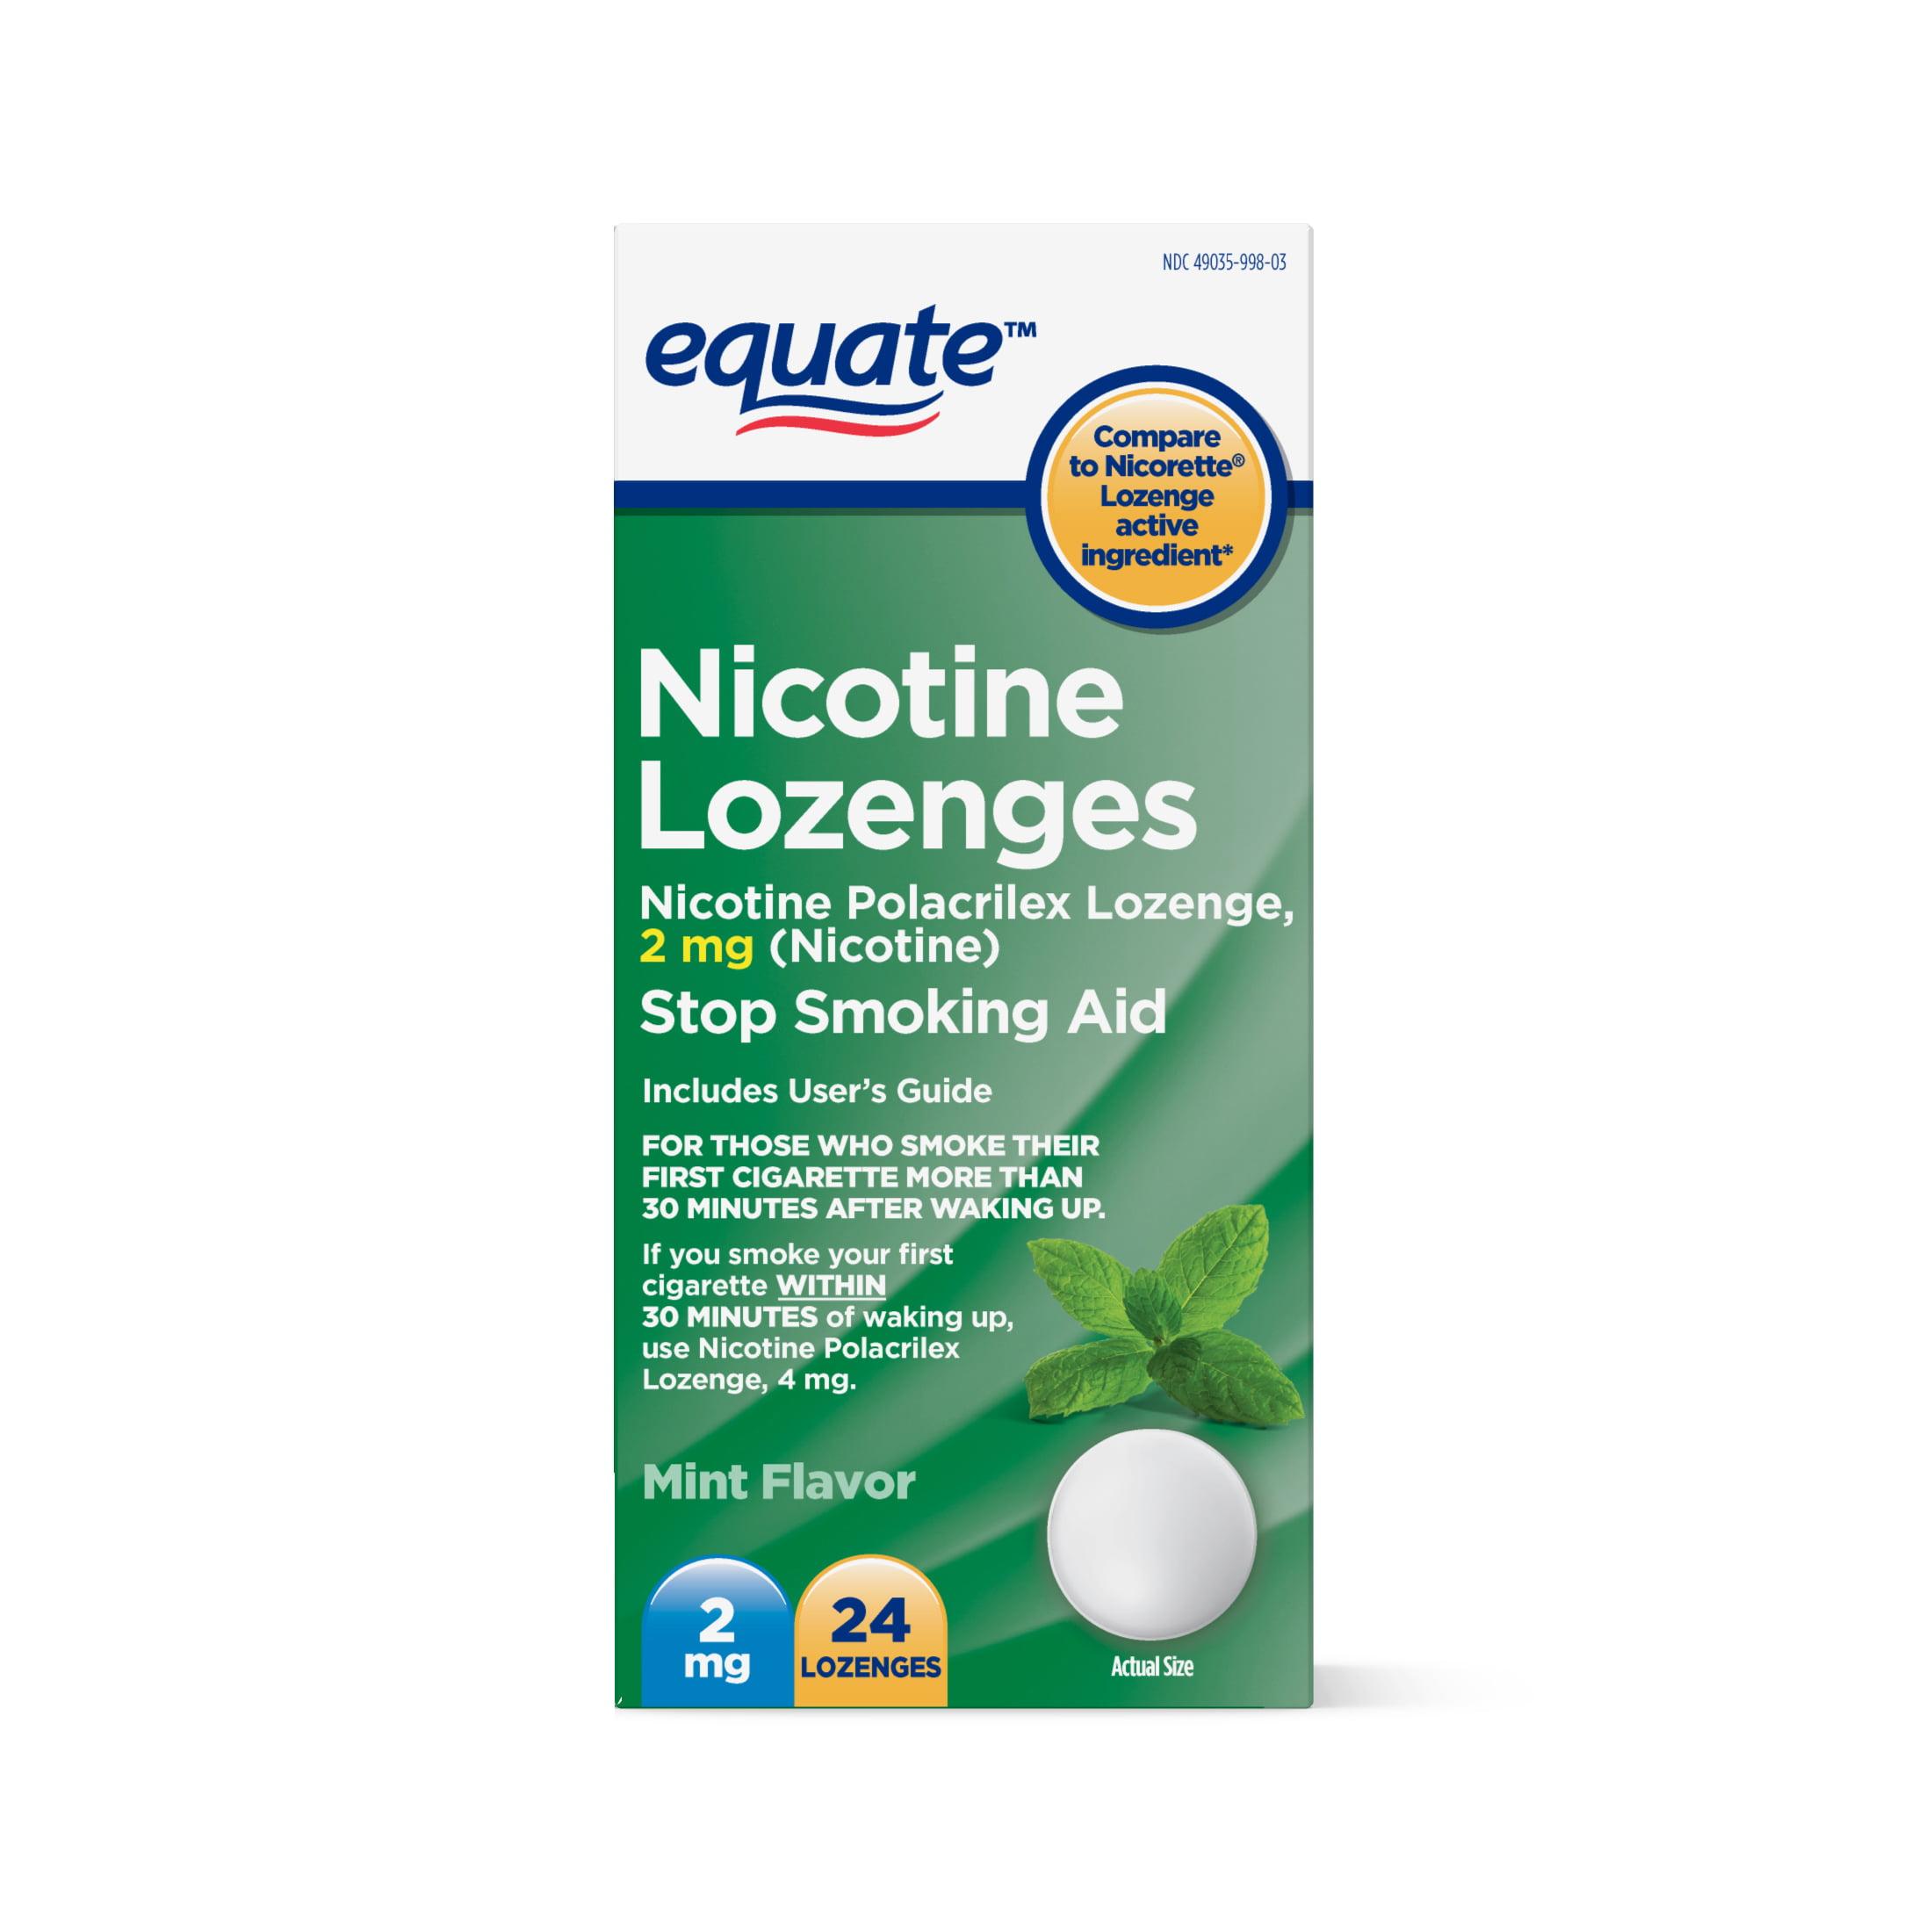 Equate Nicotine Lozenges, Mint Flavor, 2 mg, 24 Ct